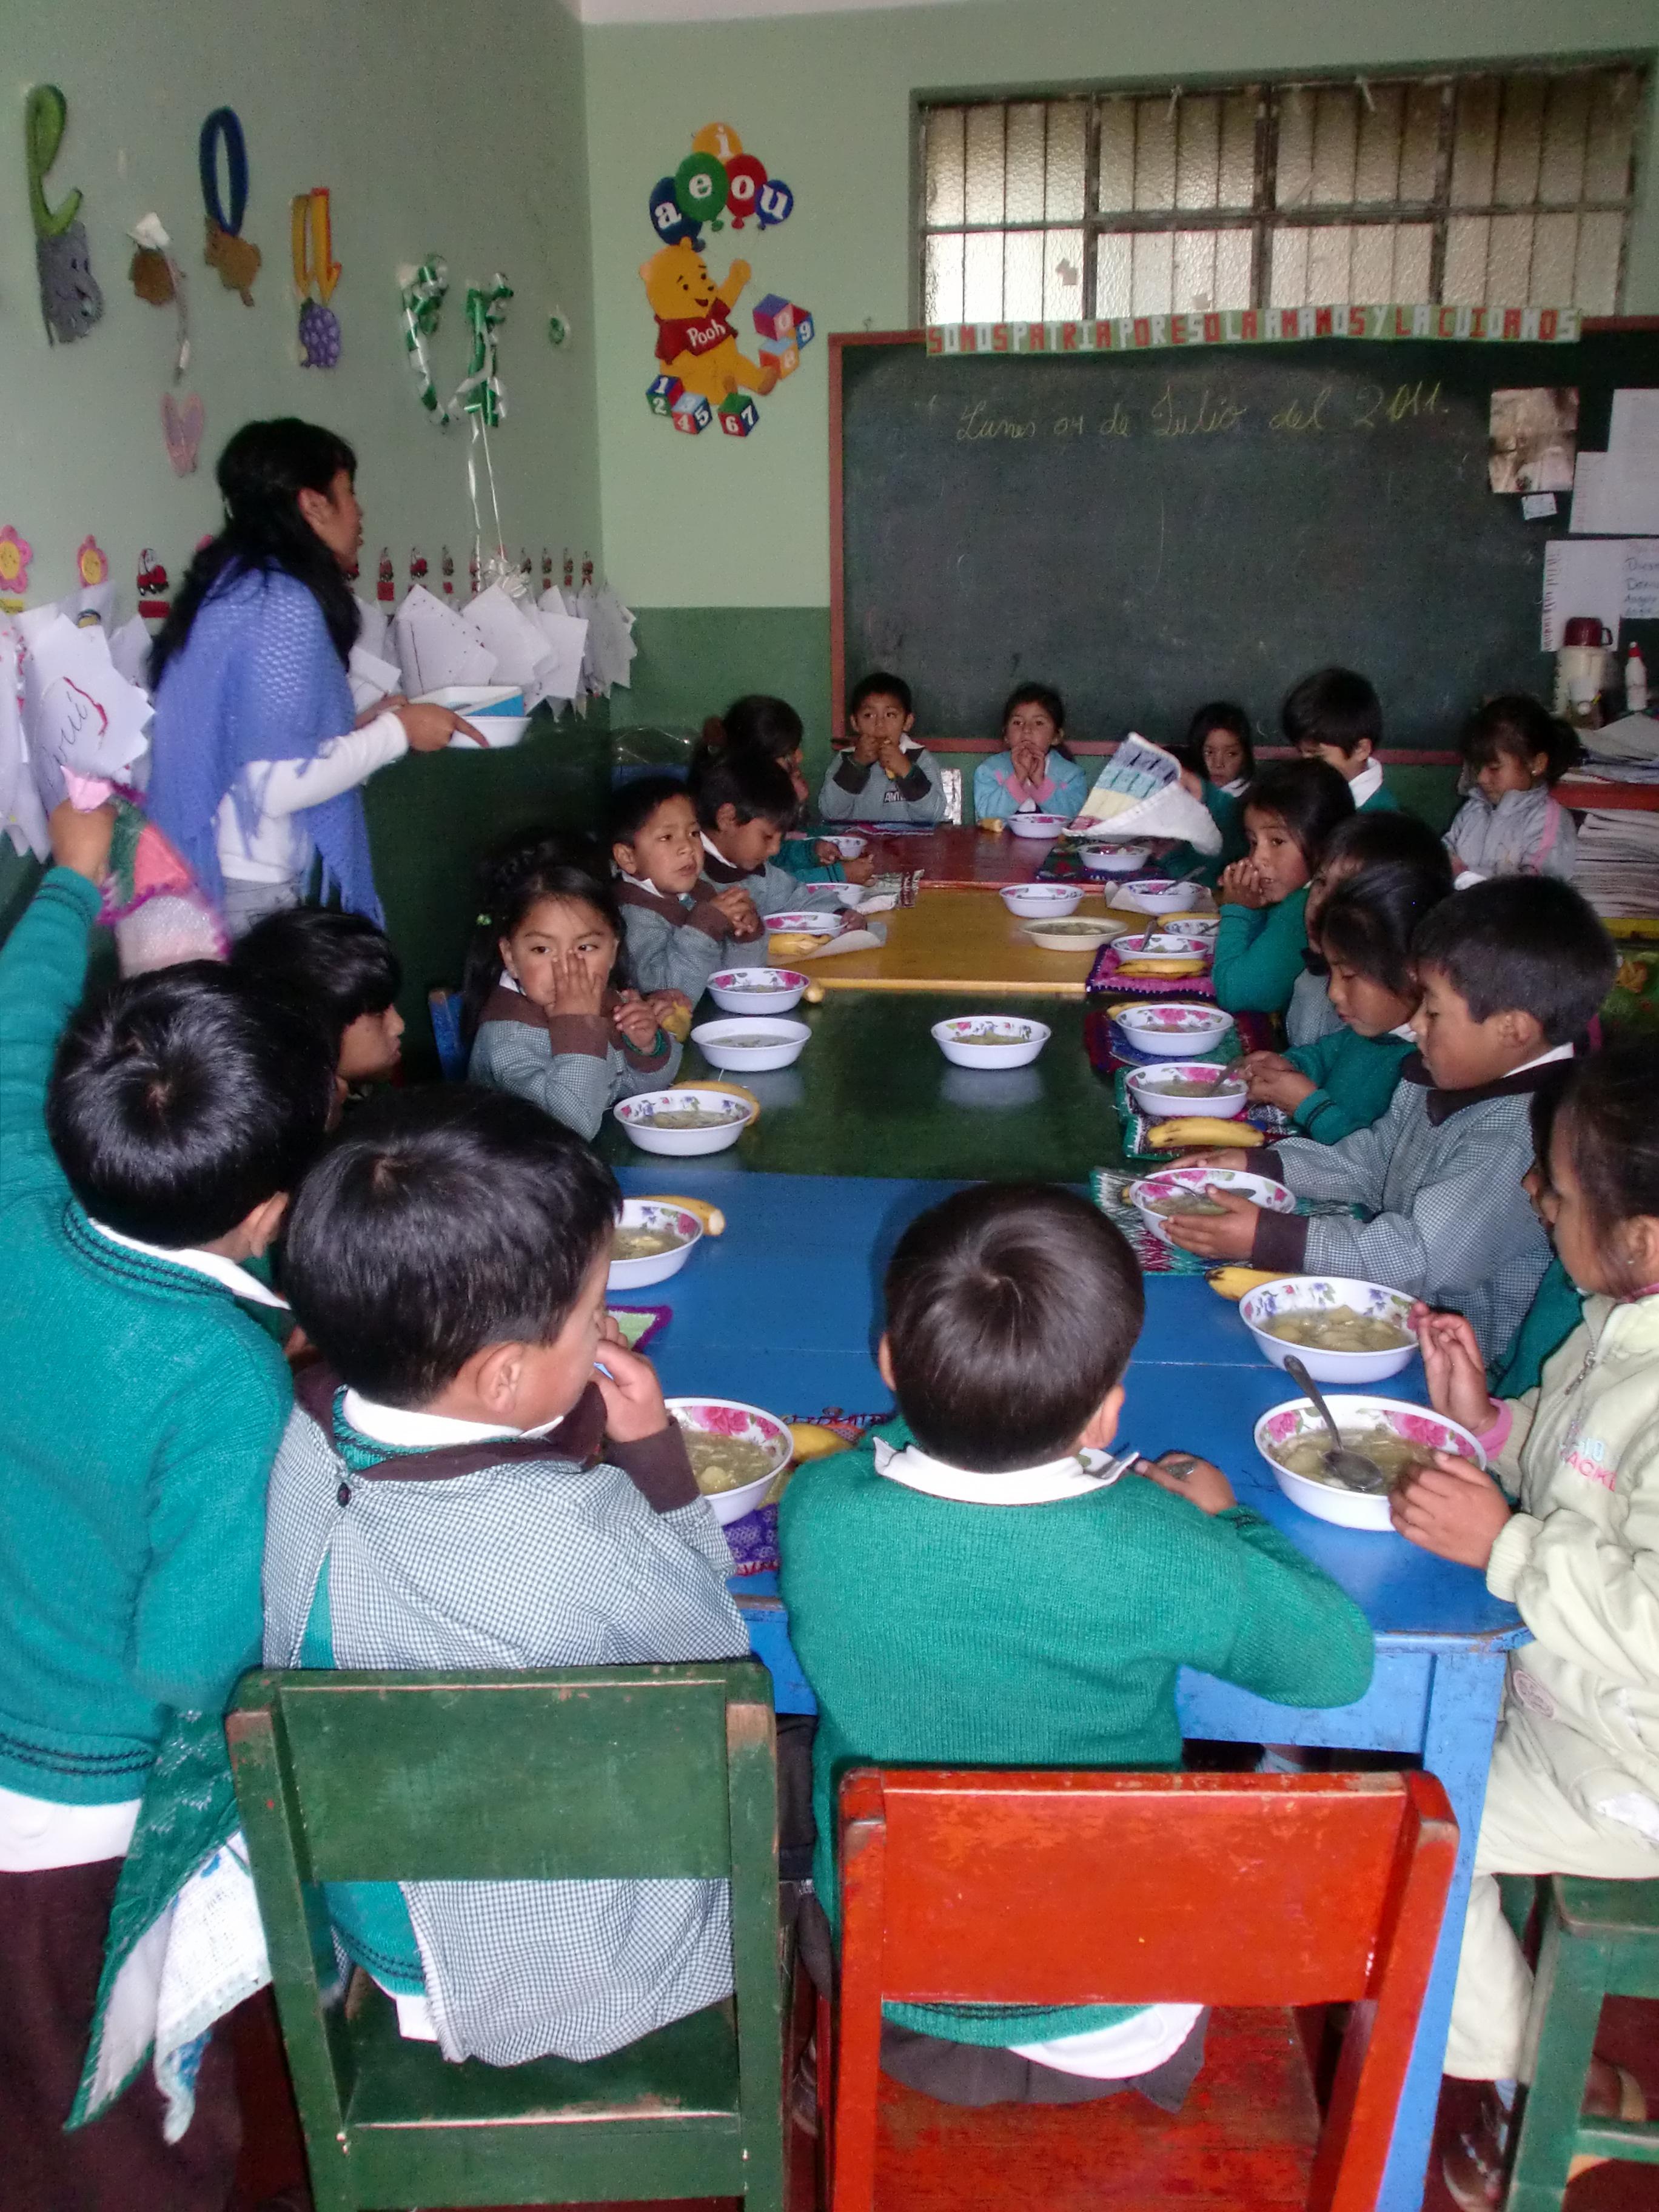 Comedores escolares aulas abiertas en cajamarca for Comedores escolares bogota